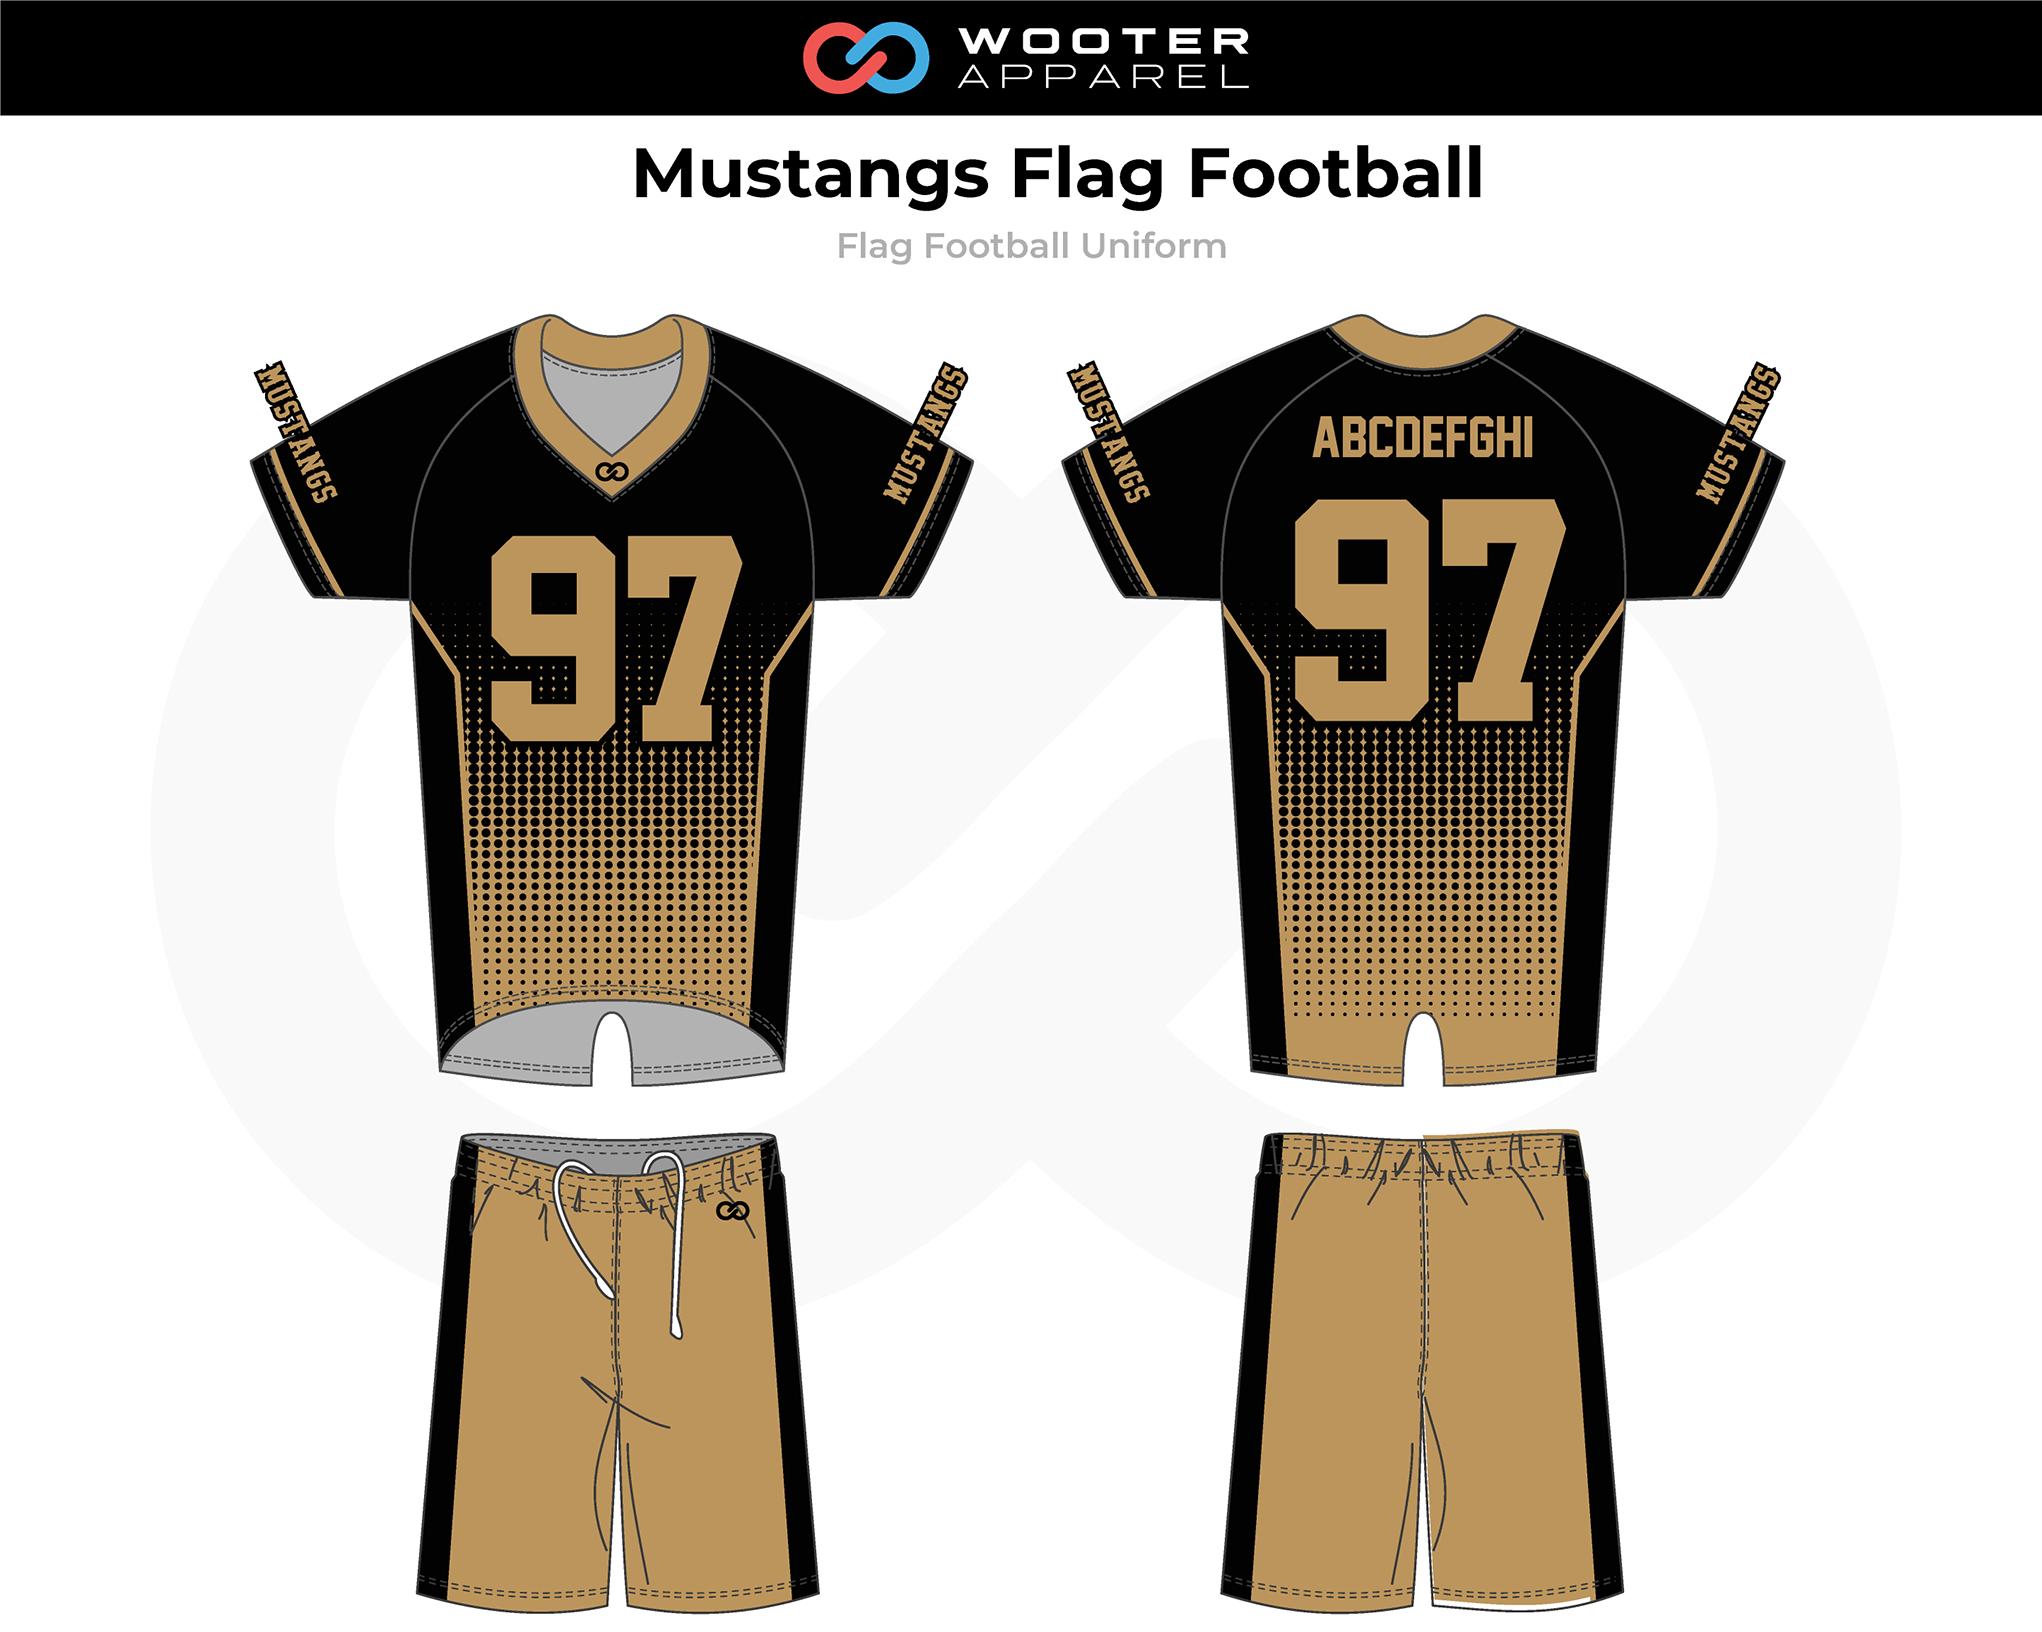 2019-02-20 Mustangs Flag Football Uniform (Dots).png